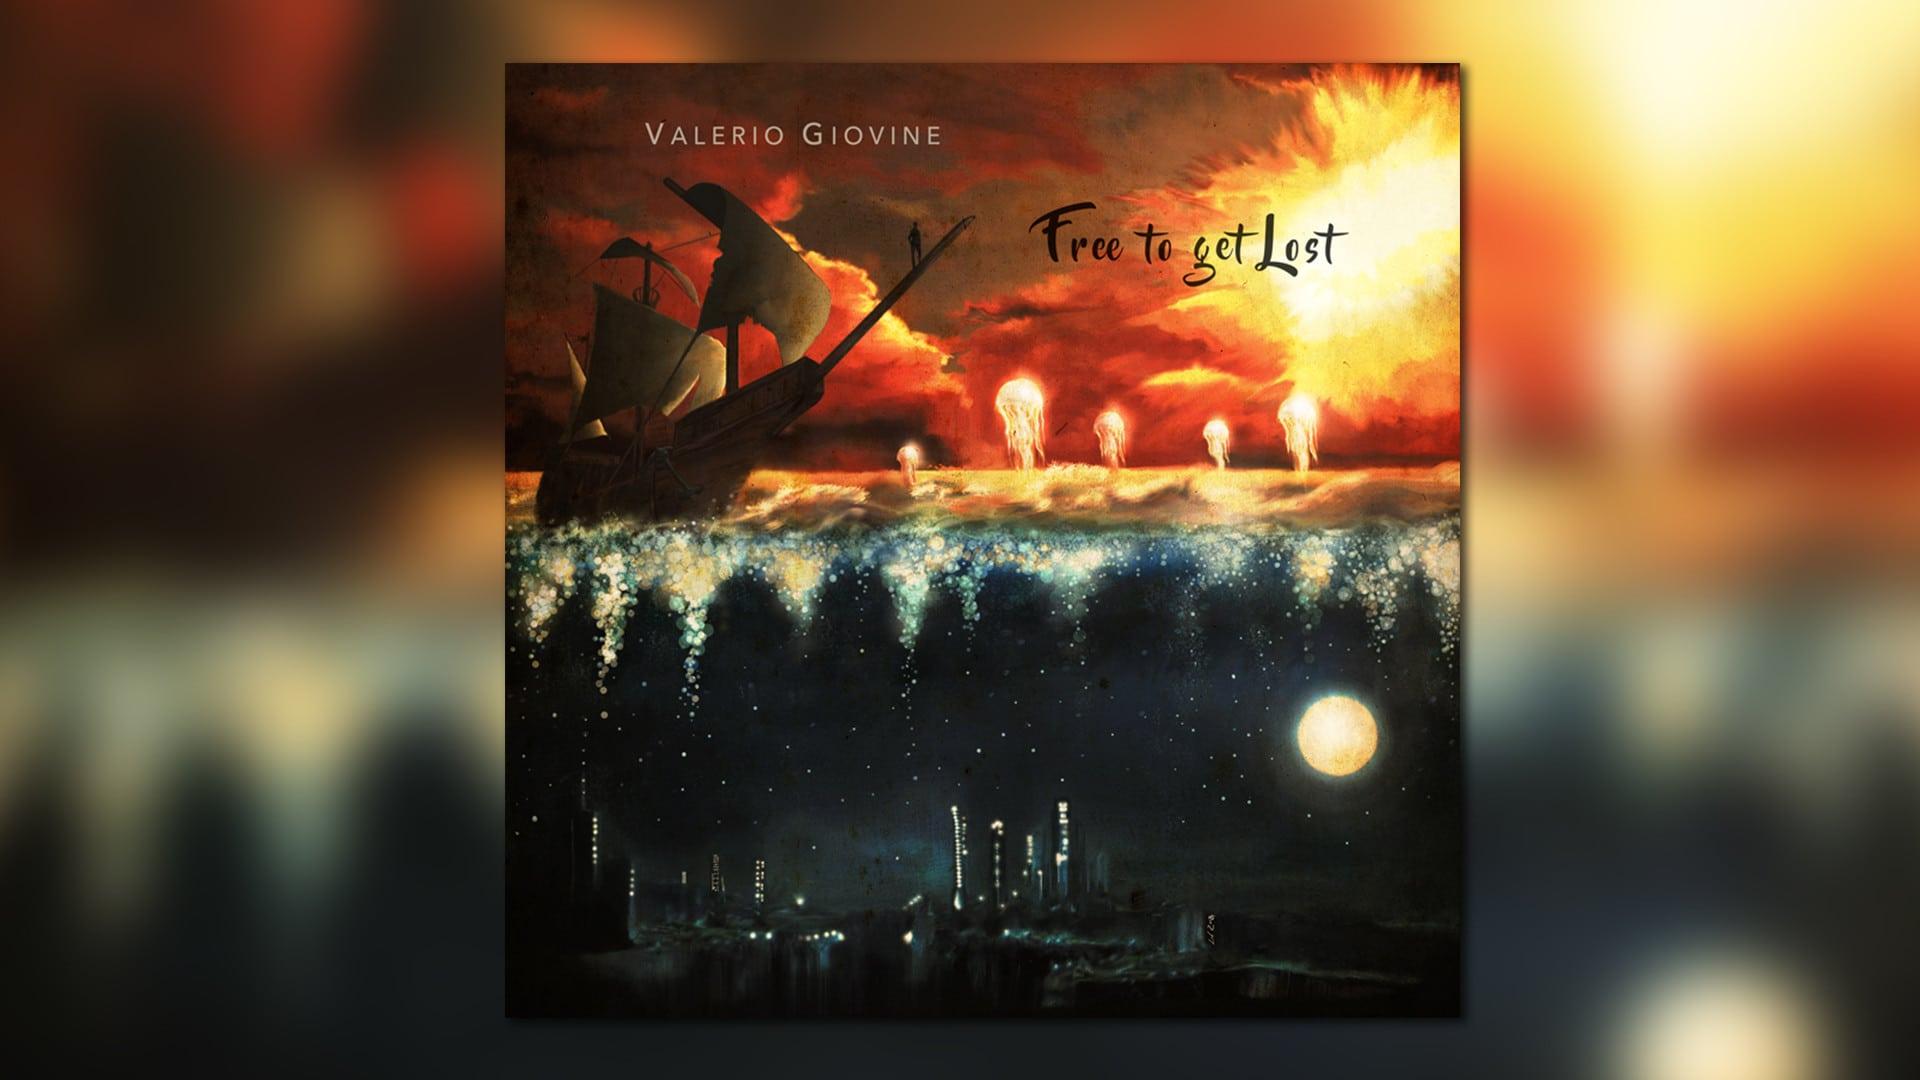 free-to-get-lost-valerio-giovine-composer